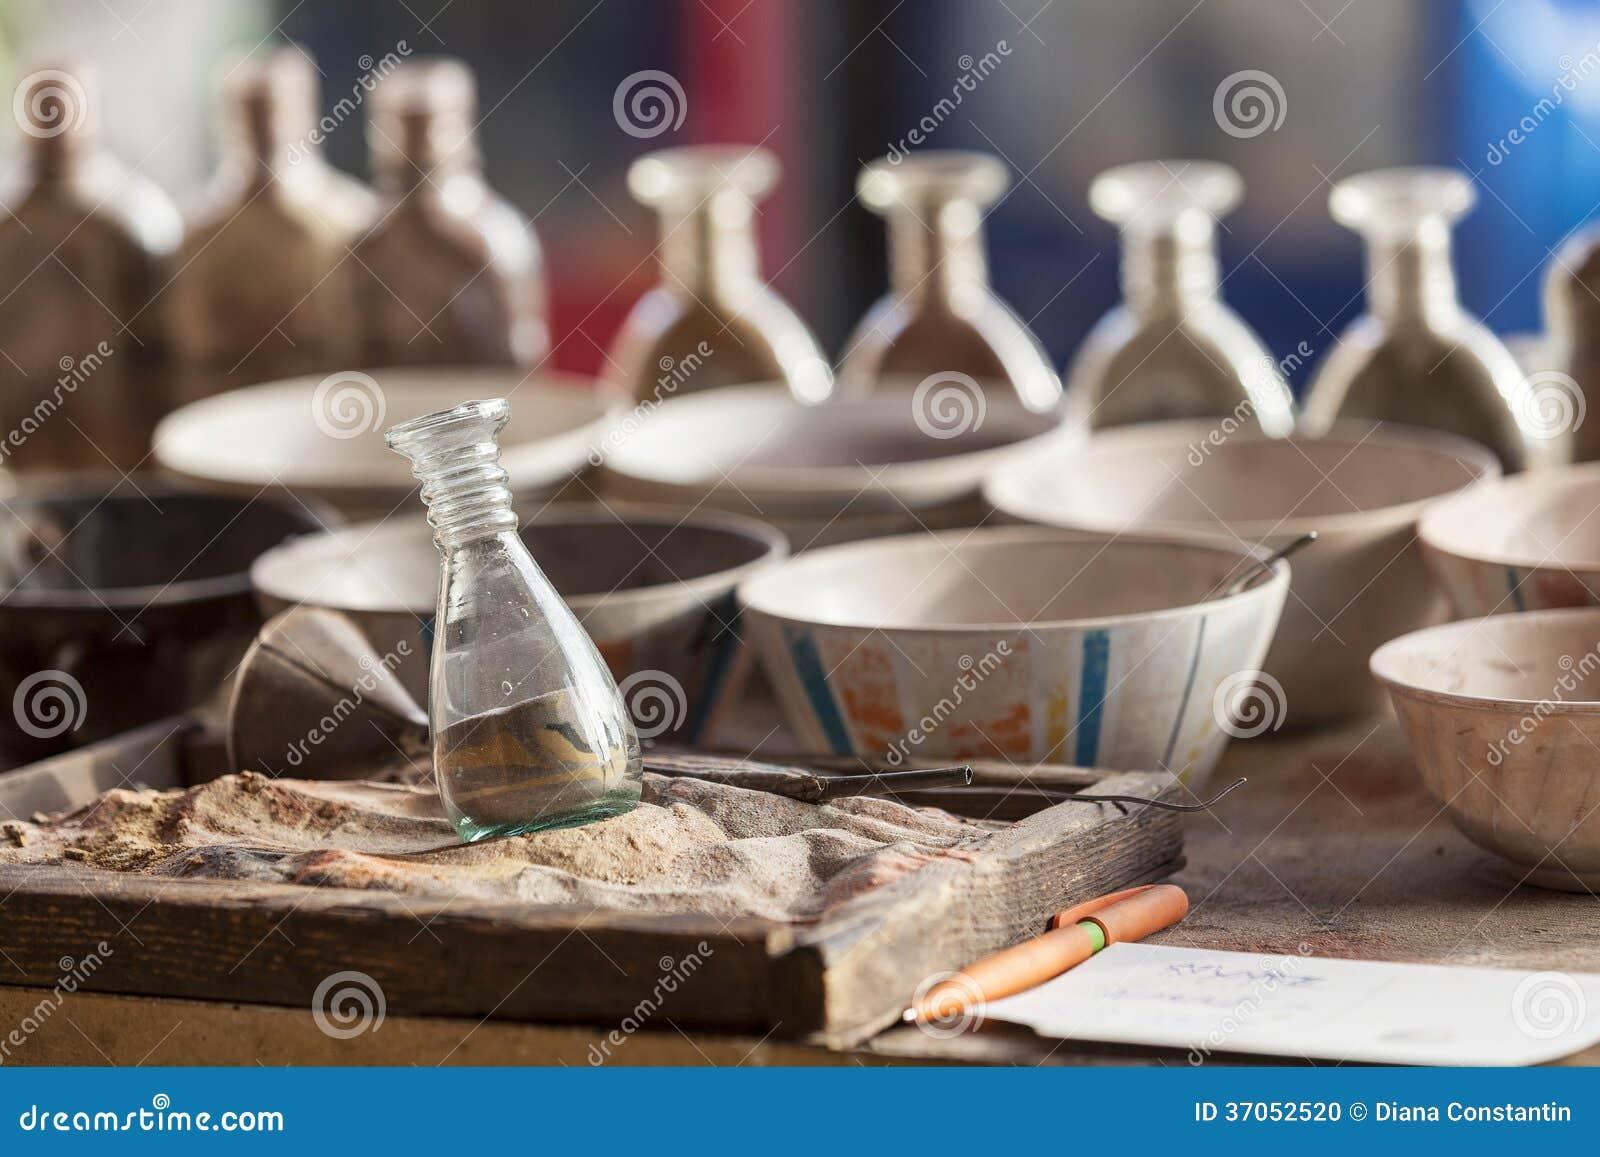 Outils pour sandpainting